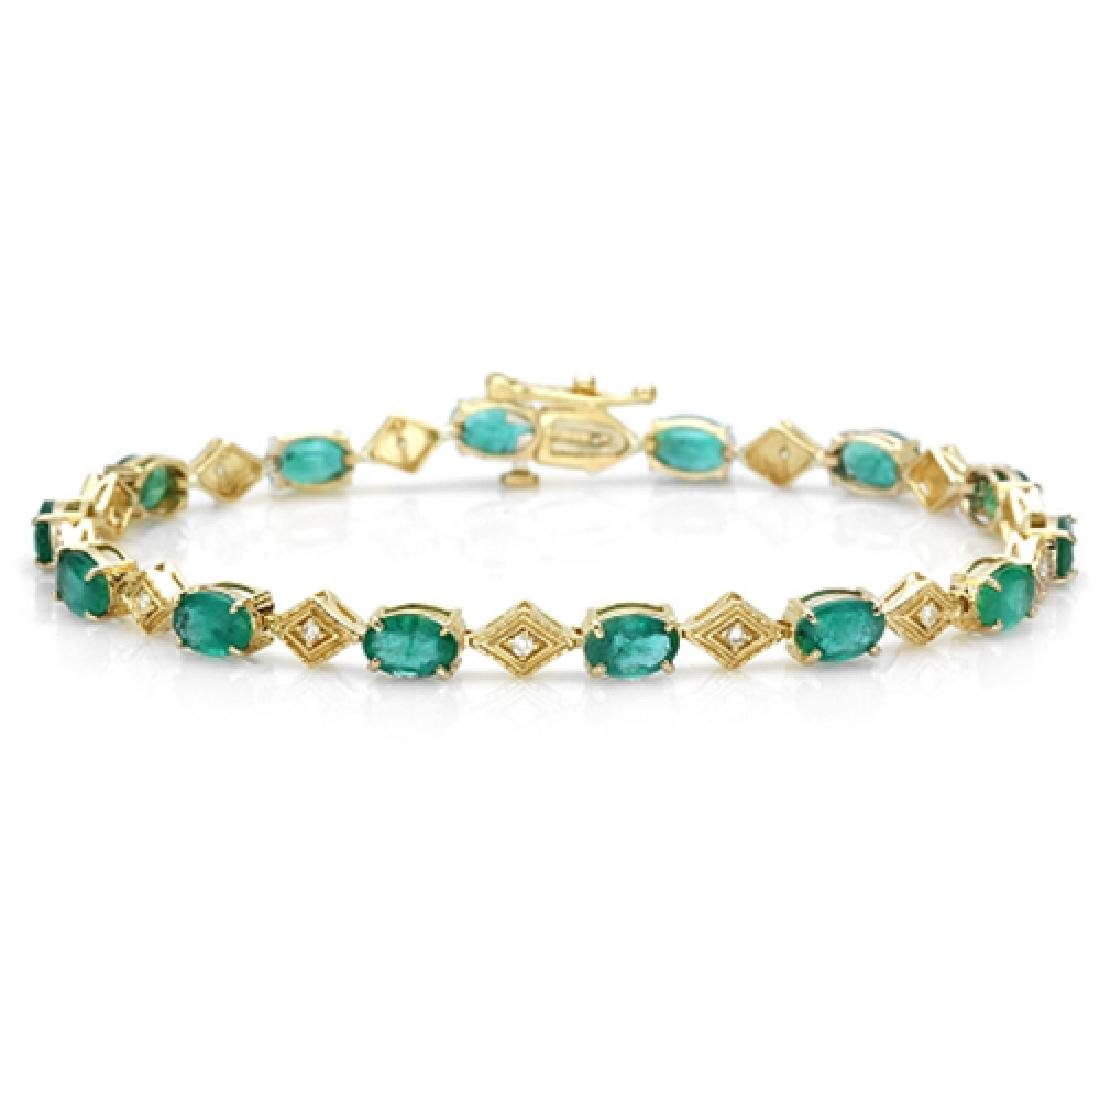 6.17 Carat Natural Emerald 18K Solid Yellow Gold